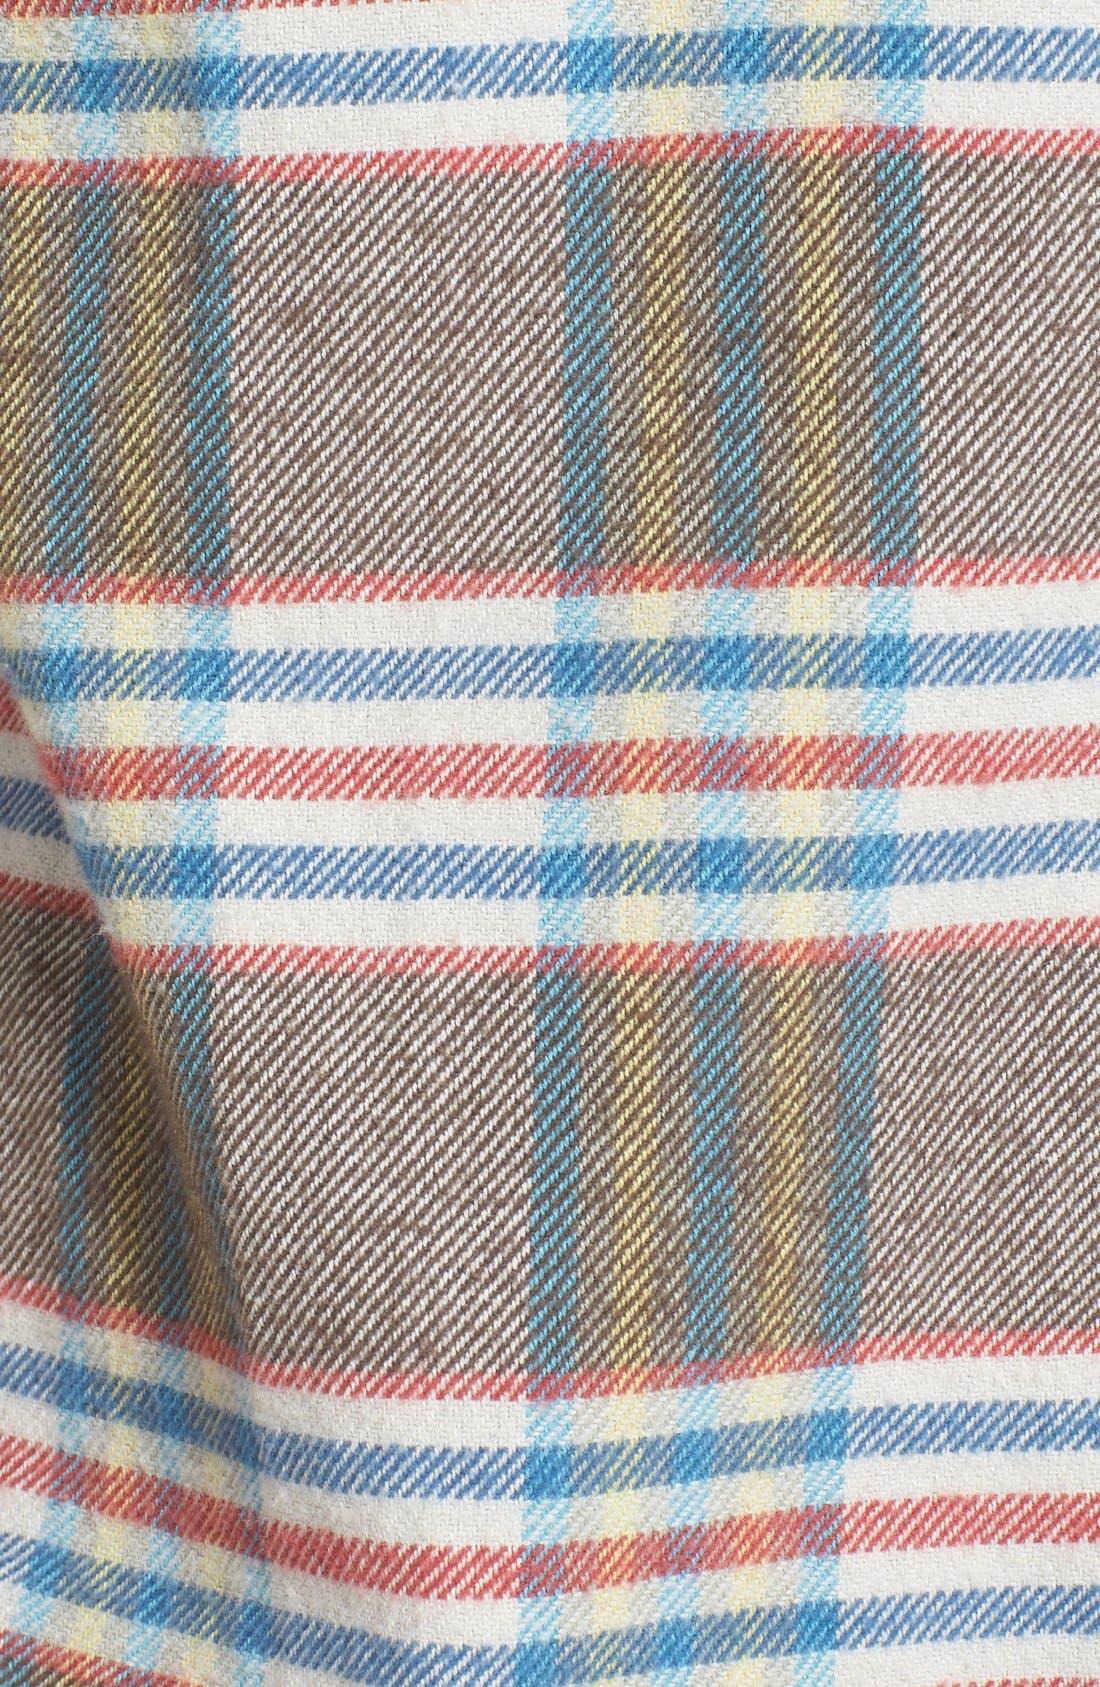 'Flannel Time' Original FitPlaid Flannel Shirt,                             Alternate thumbnail 3, color,                             200